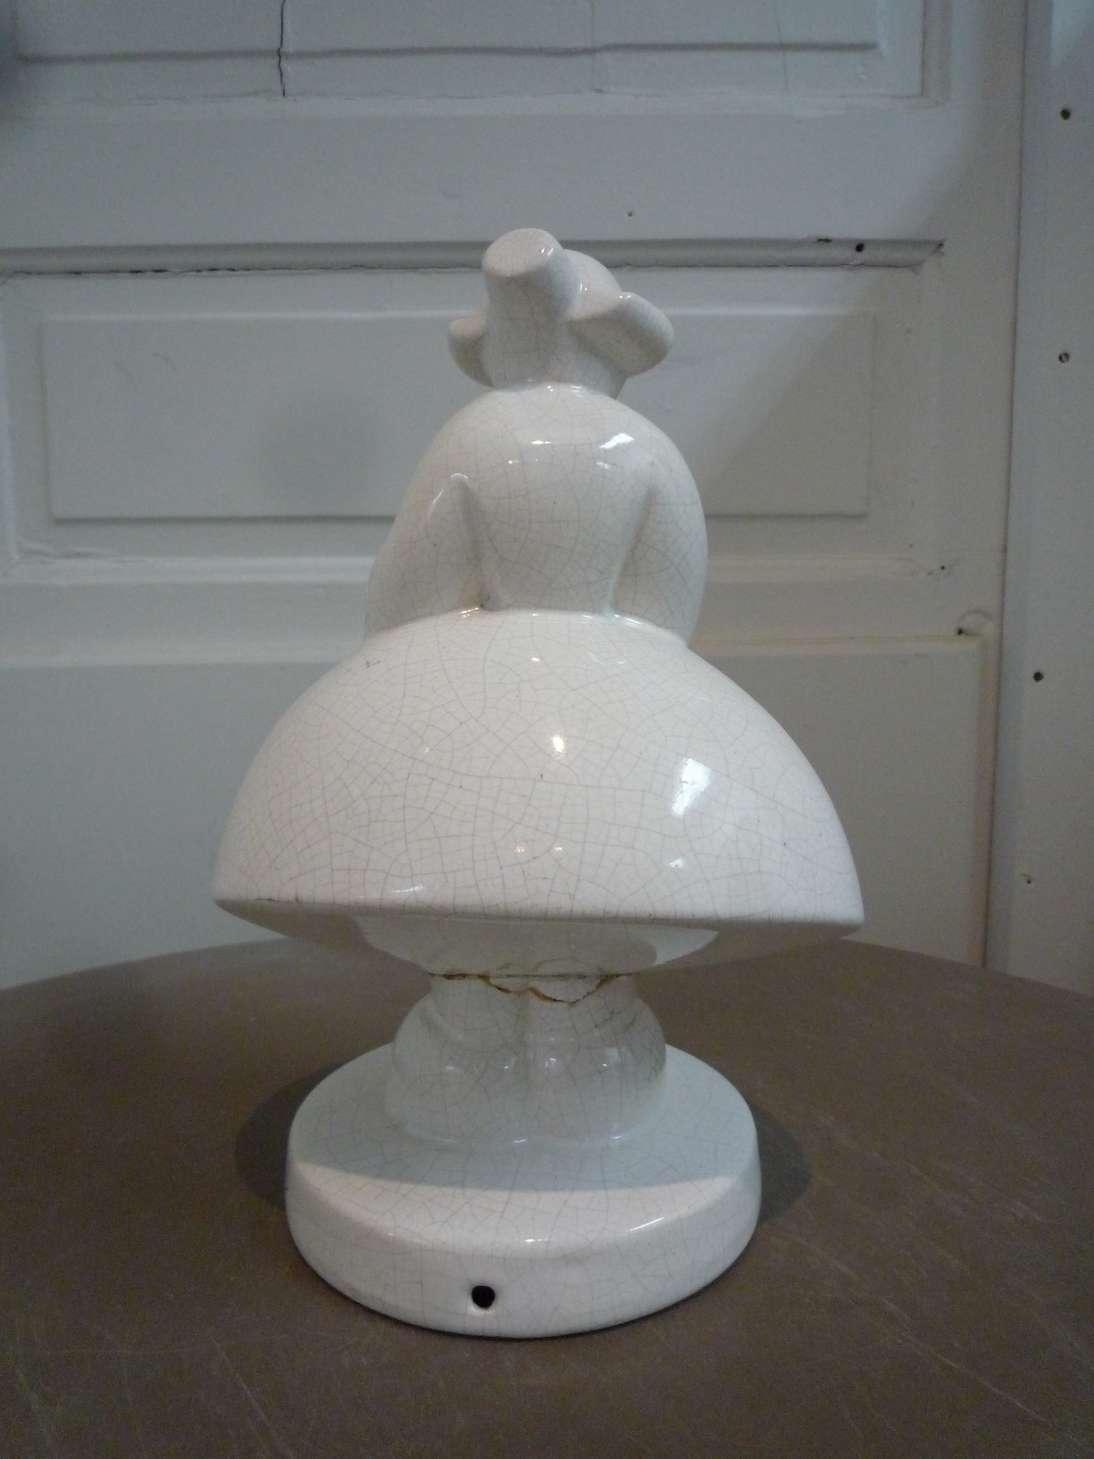 faience-email-robj-lampe-becassine-craquele-craquelures-art-1926-ateliers-restaurarte-restauration-decoratif-chevet-ceramique.jpg